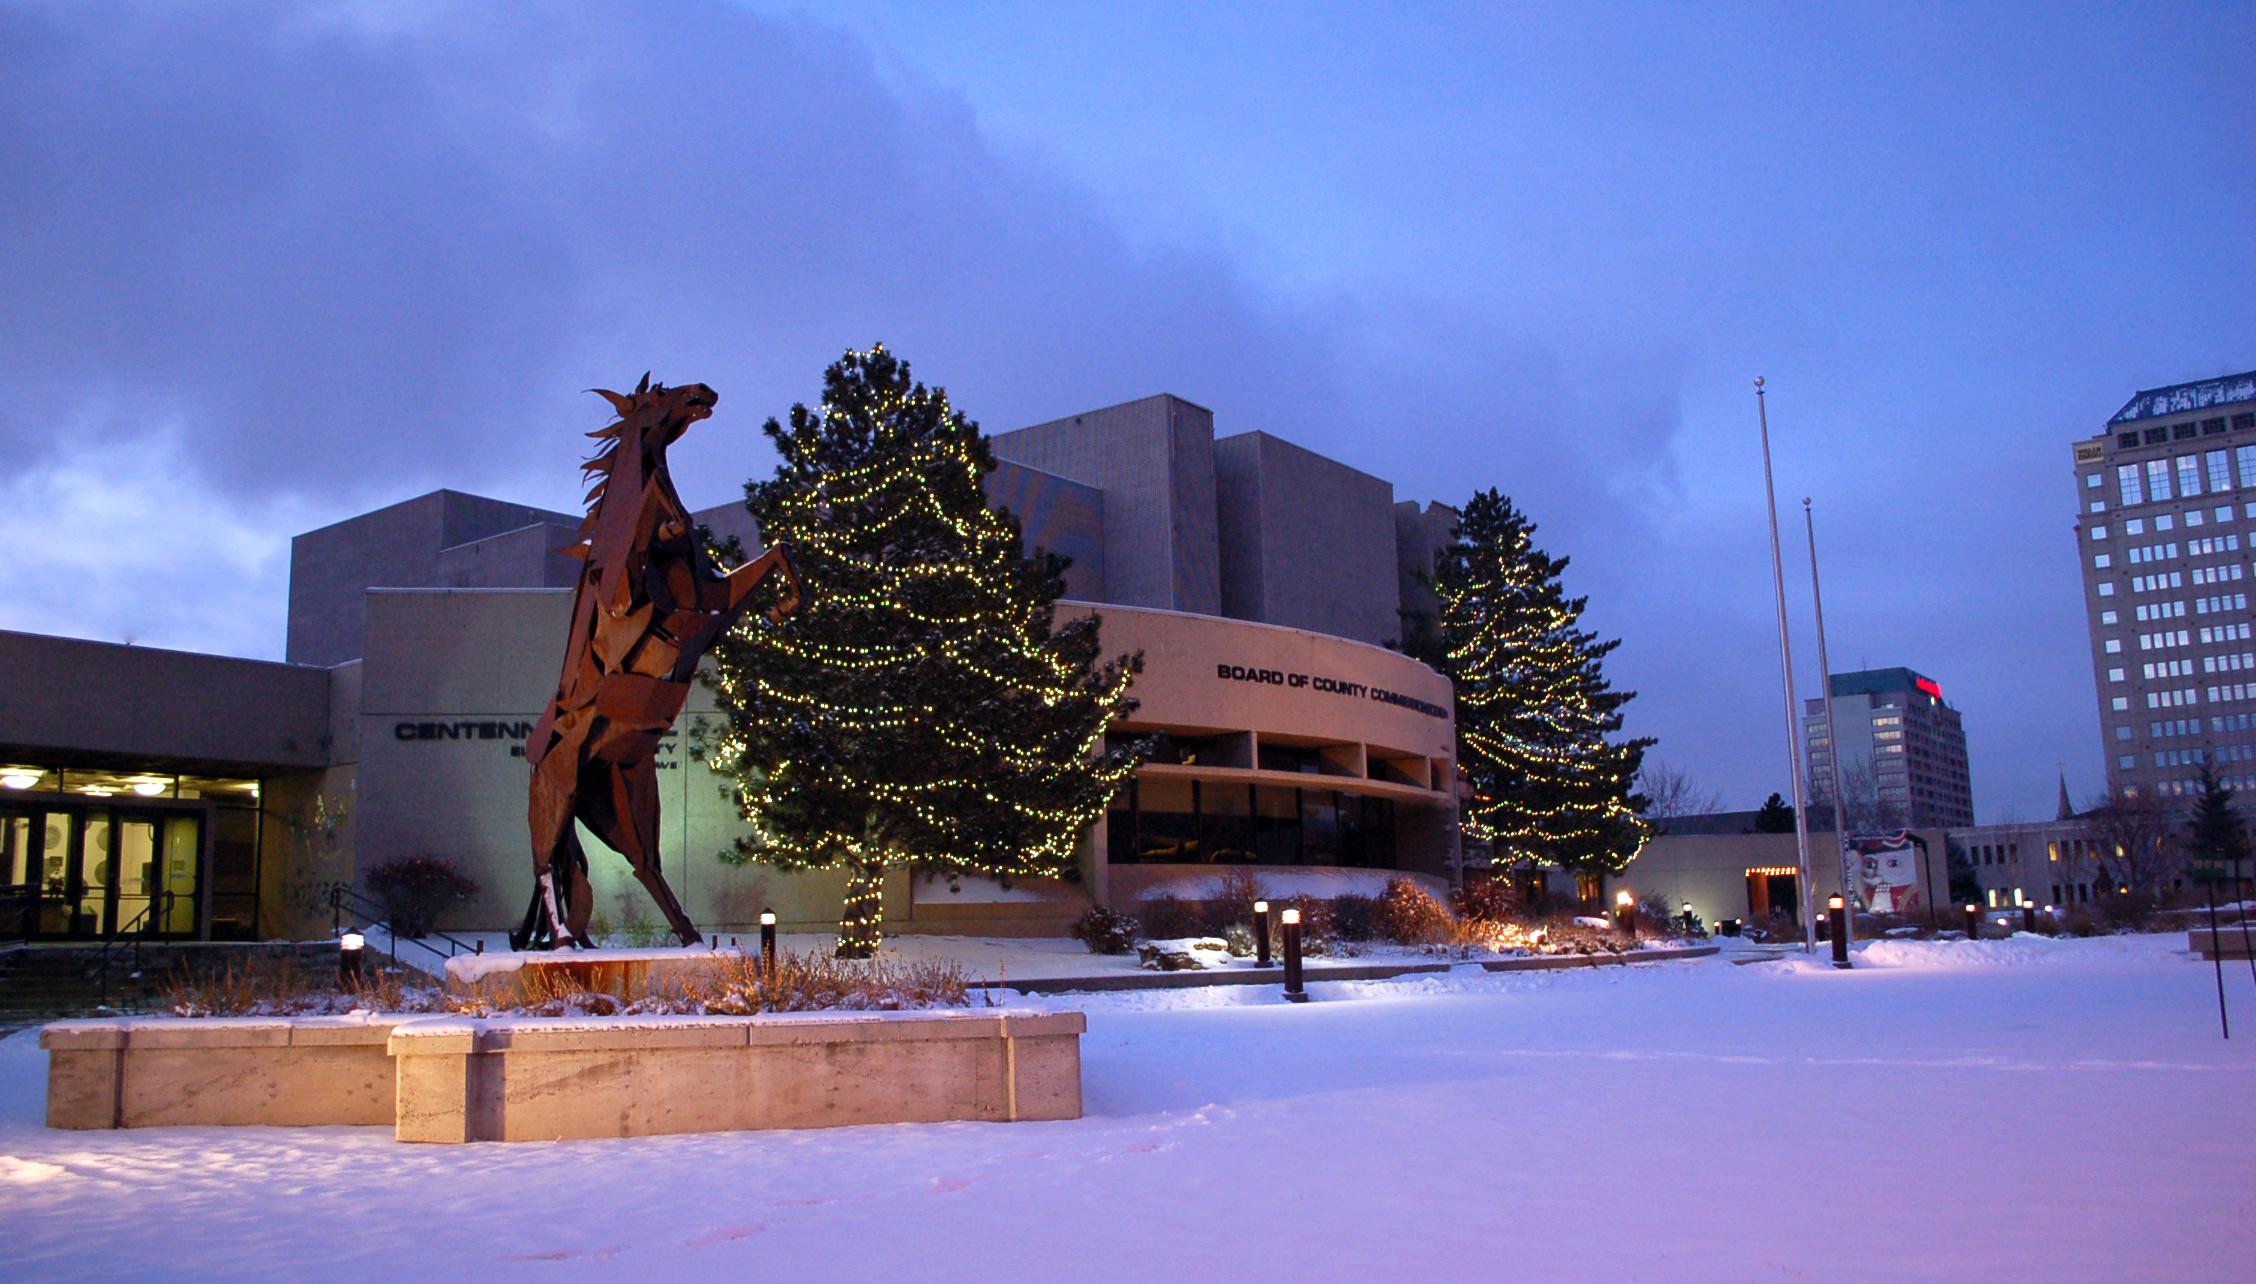 Rearing Horse winter image